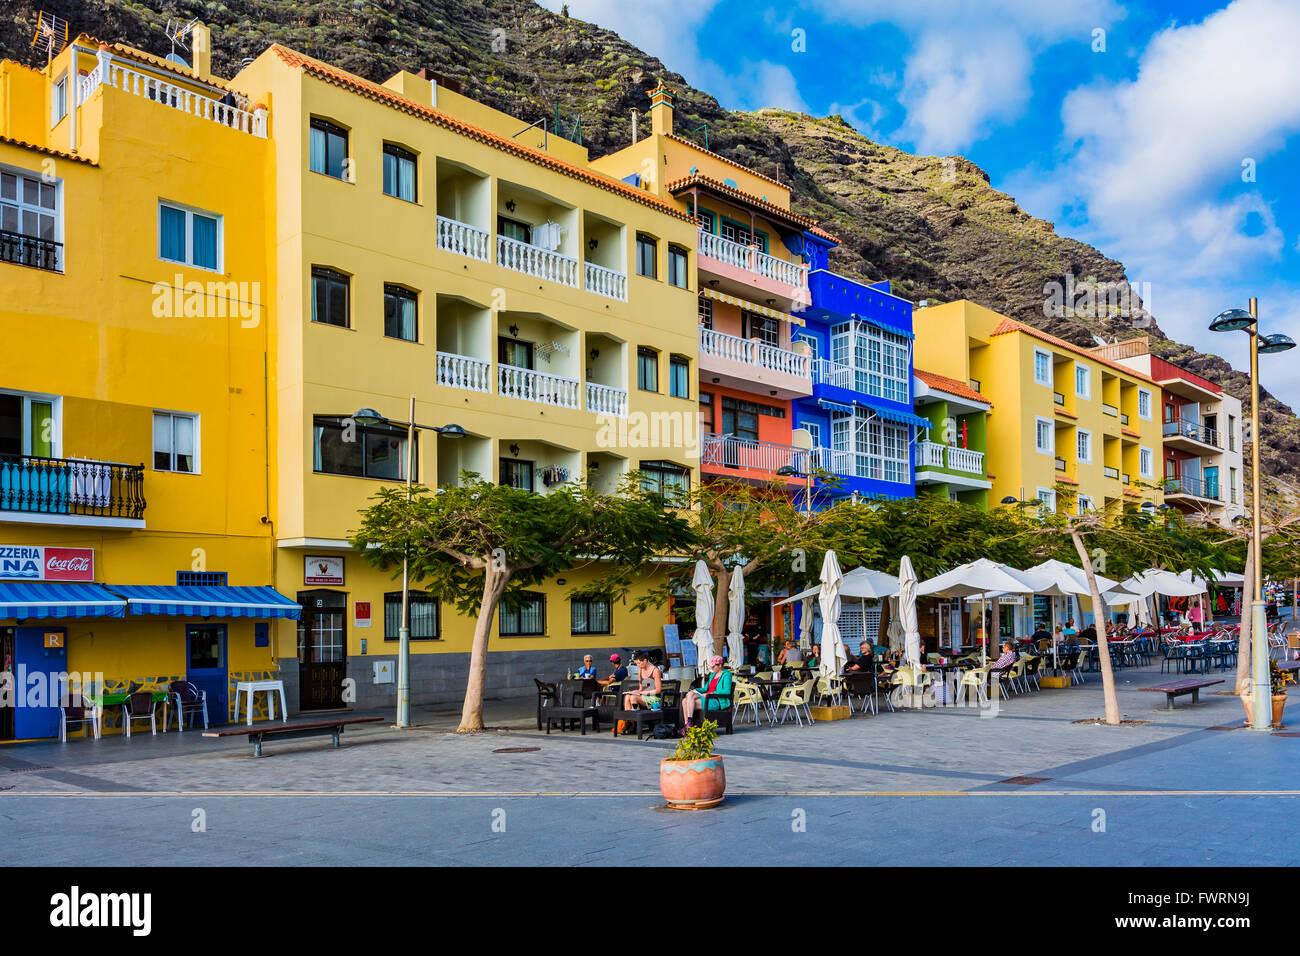 Der Hafen von Tazacorte. Tazacorte, La Palma, Teneriffa, Kanarische Inseln, Spanien, Europa Stockbild